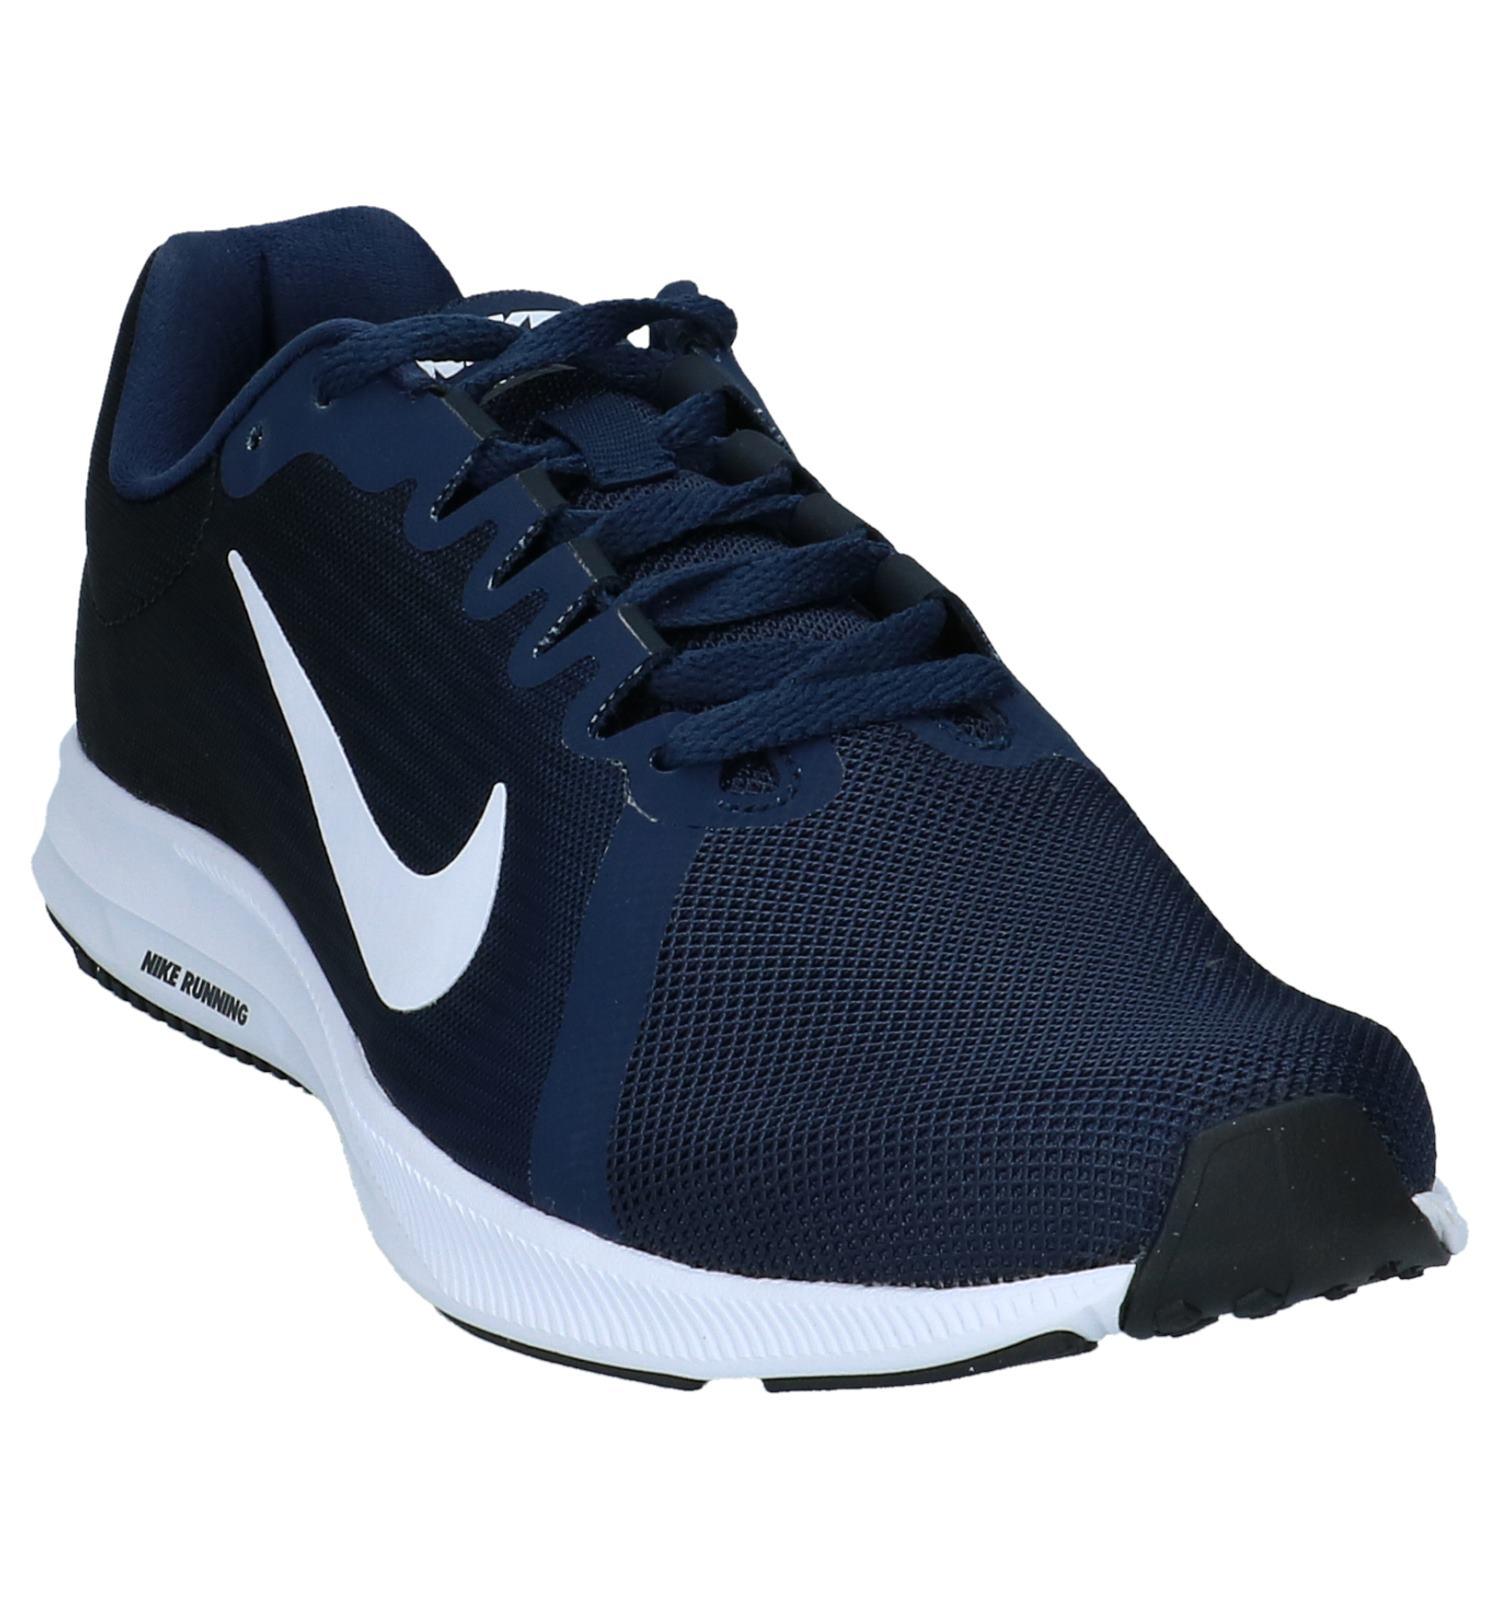 3cfeb0f61ee182 Donkerblauwe Lage Sportieve Sneakers Nike Downshifter 8 | TORFS.BE | Gratis  verzend en retour